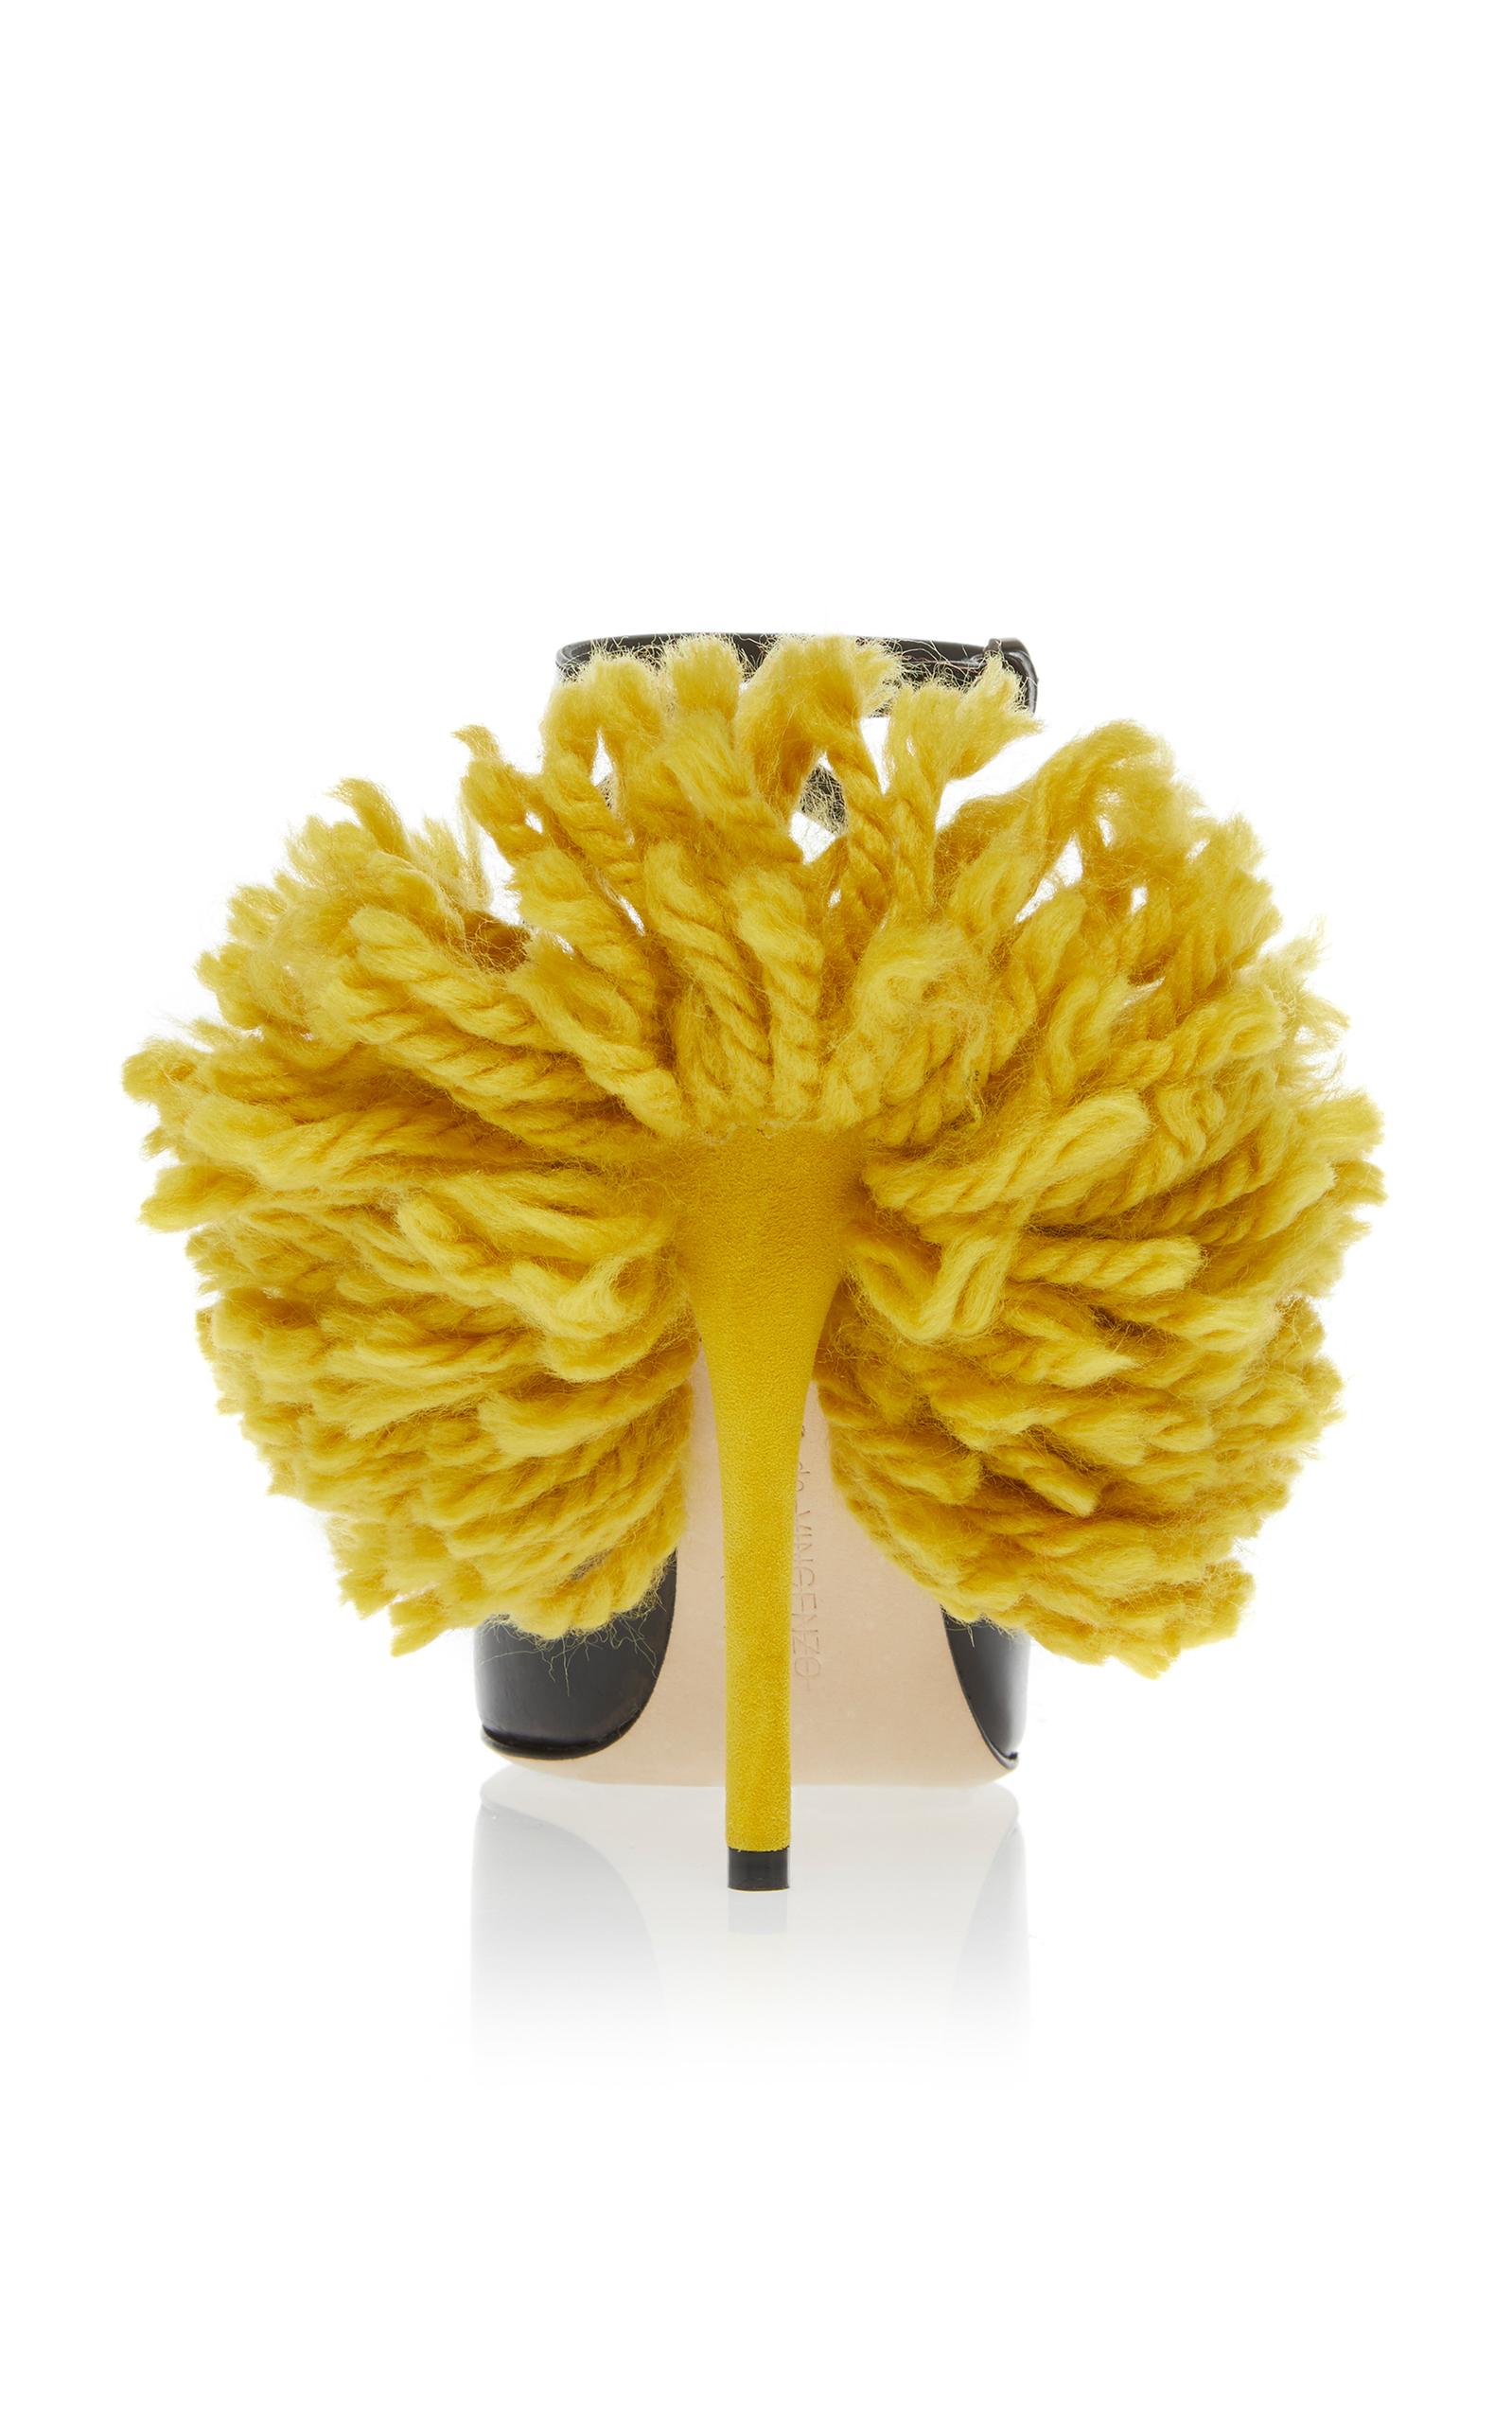 Fringe Pump by Marco de Vincenzo | Moda Operandi